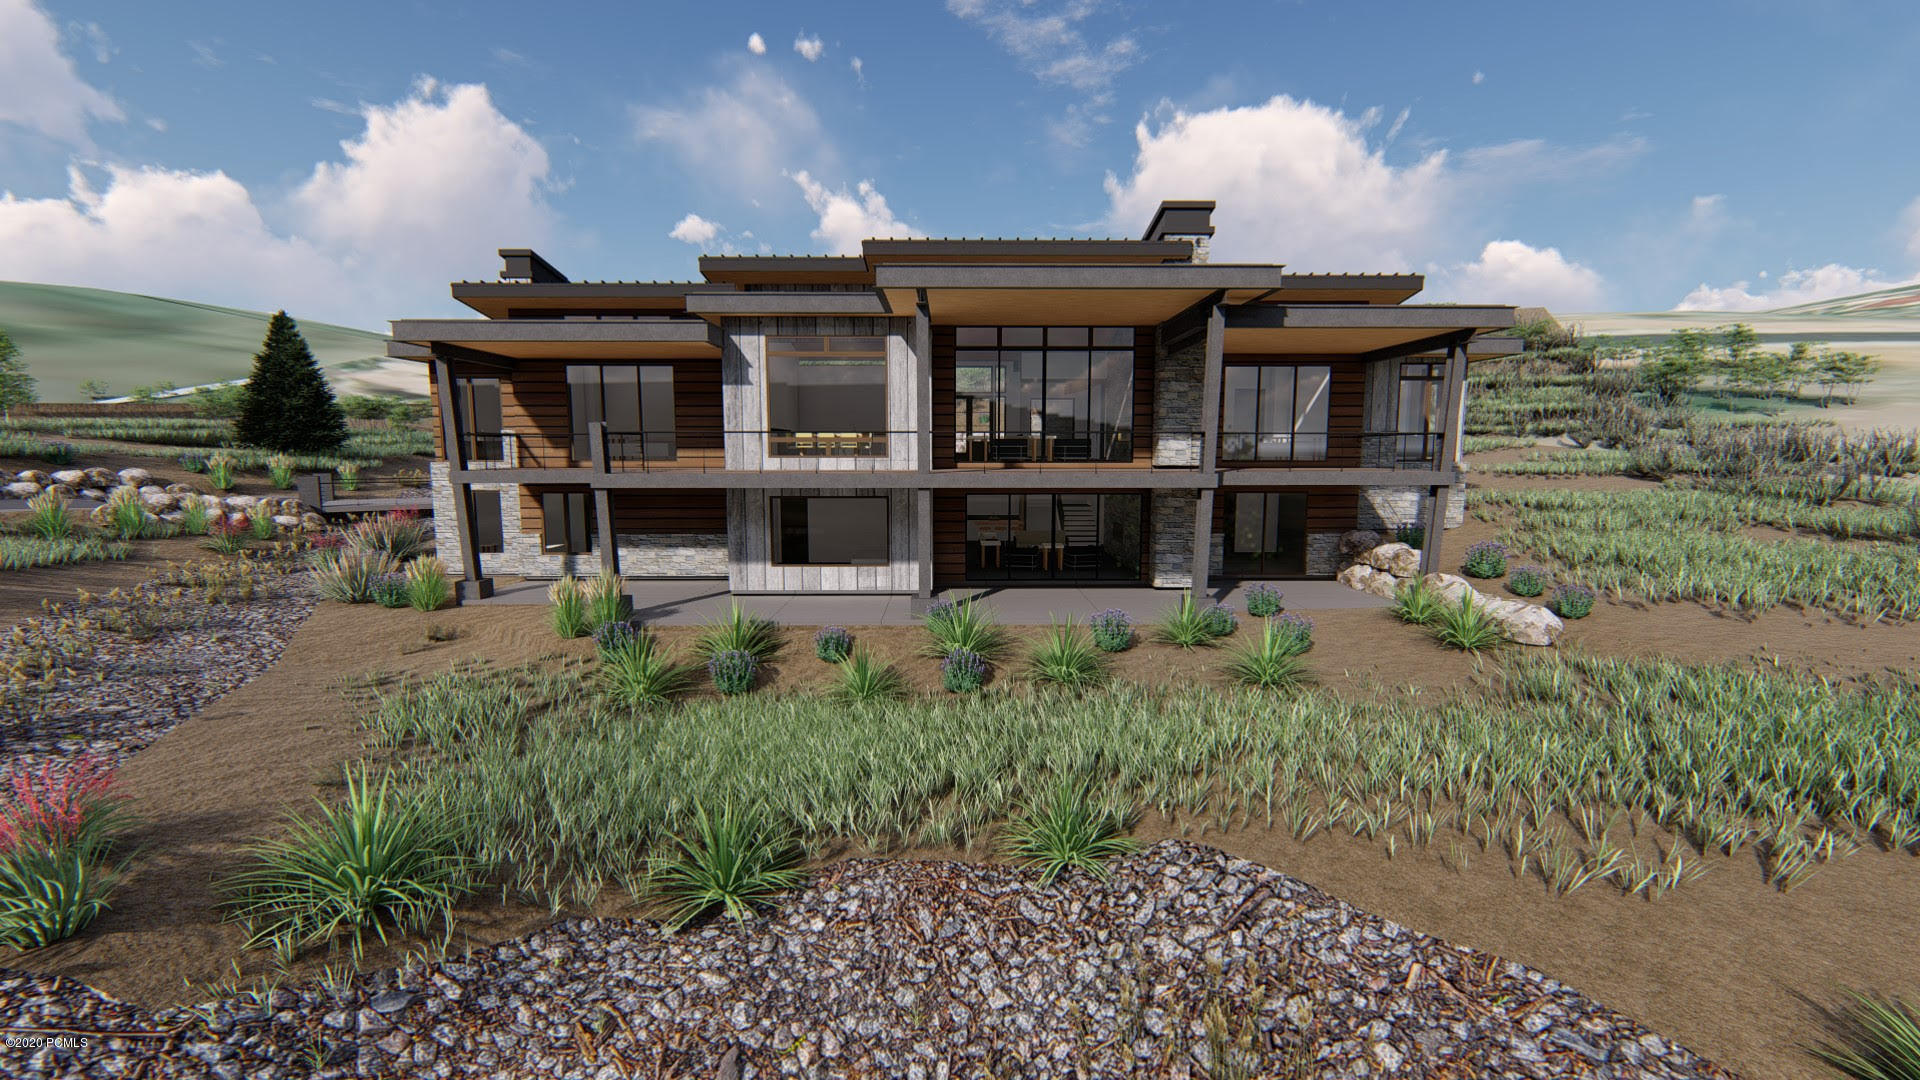 4183 Aspen Camp Loop, Park City, Utah 84098, 5 Bedrooms Bedrooms, ,7 BathroomsBathrooms,Single Family,For Sale,Aspen Camp,20190109112430415765000000